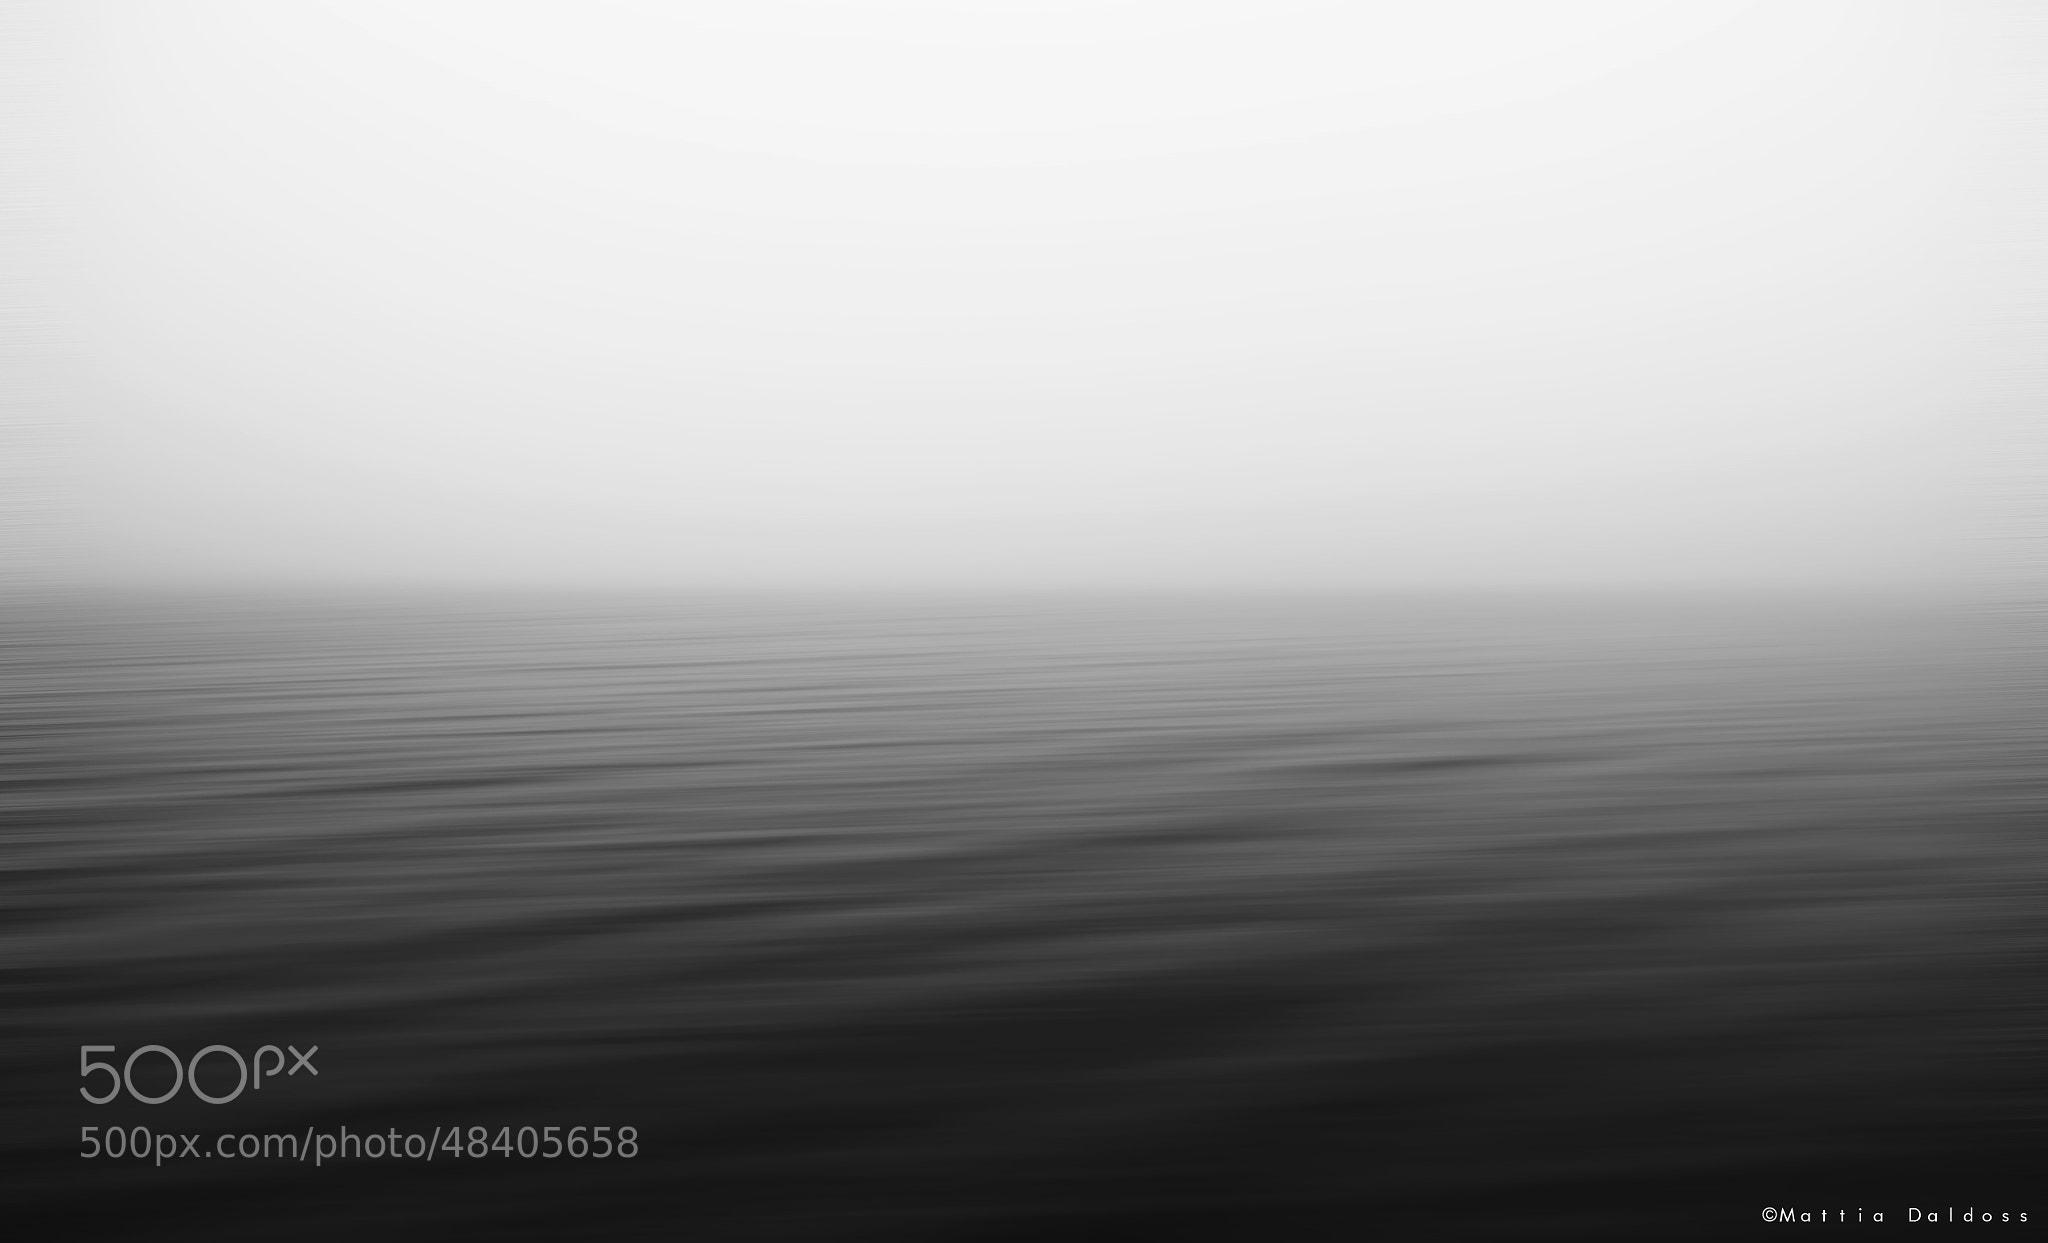 Photograph Foggy lake by Mattia Daldoss on 500px